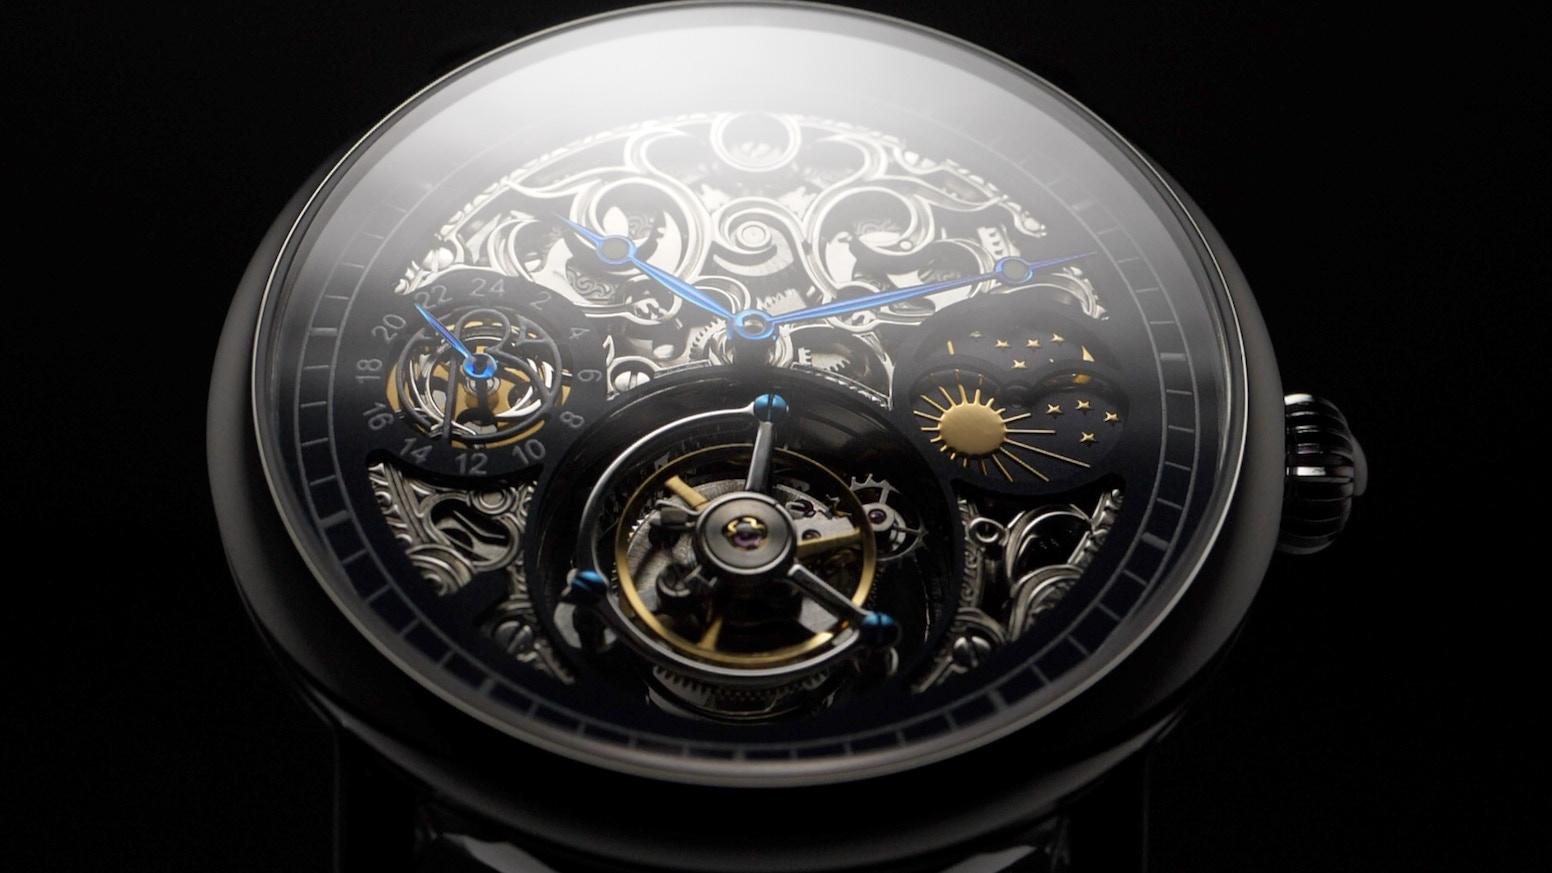 Era Timepieces Certified Millionaire Watches Under 1000 By Michael